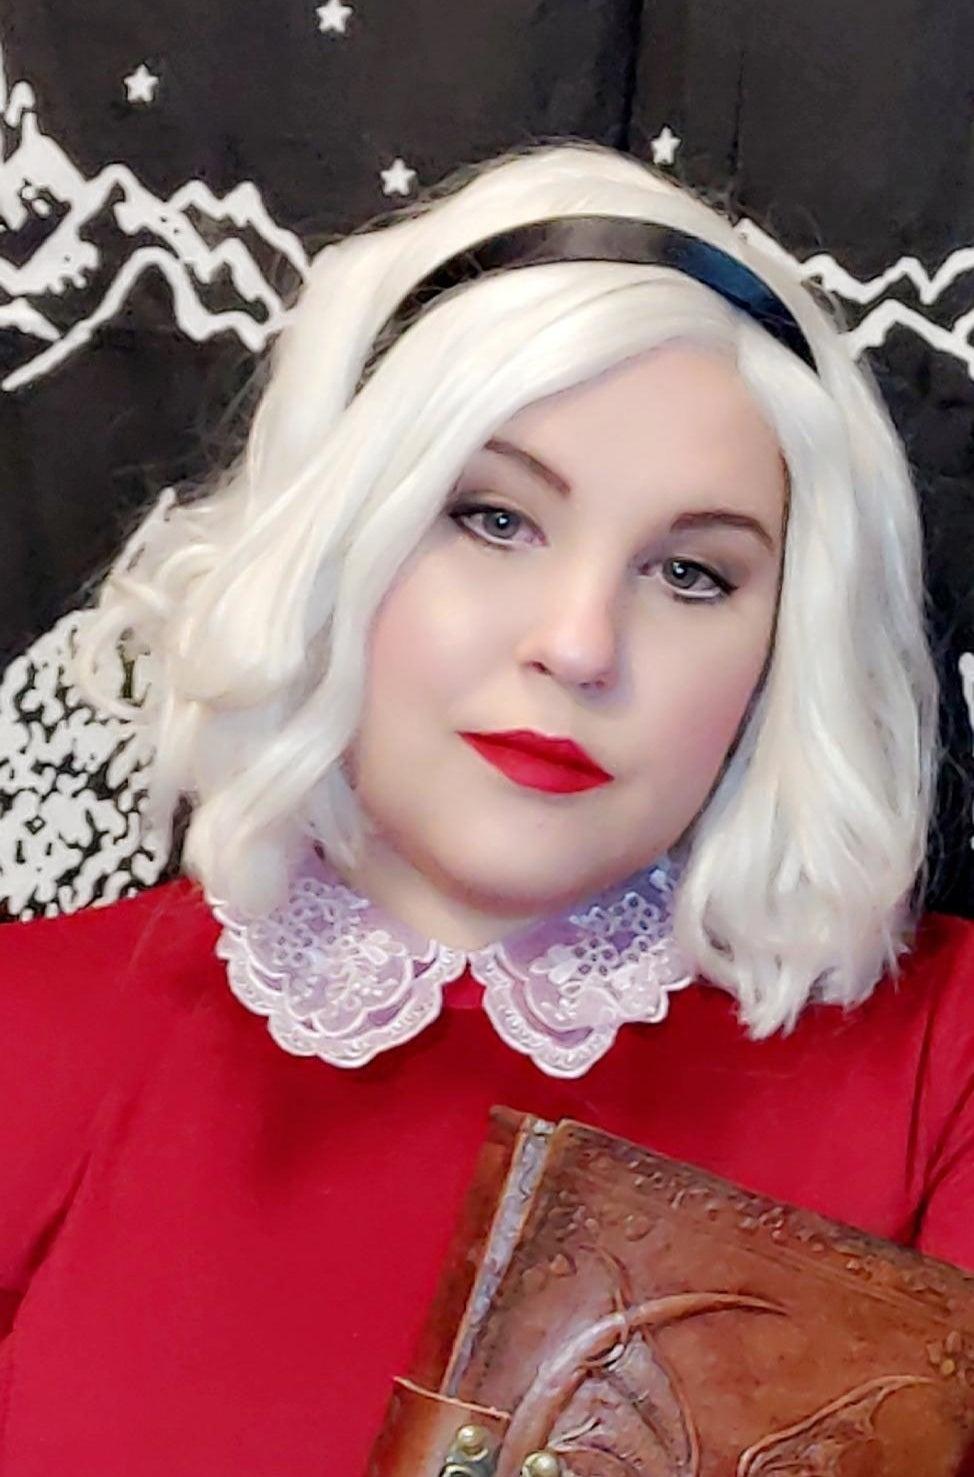 reviewer image wearing the black satin headband as part of Sabrina cosplay